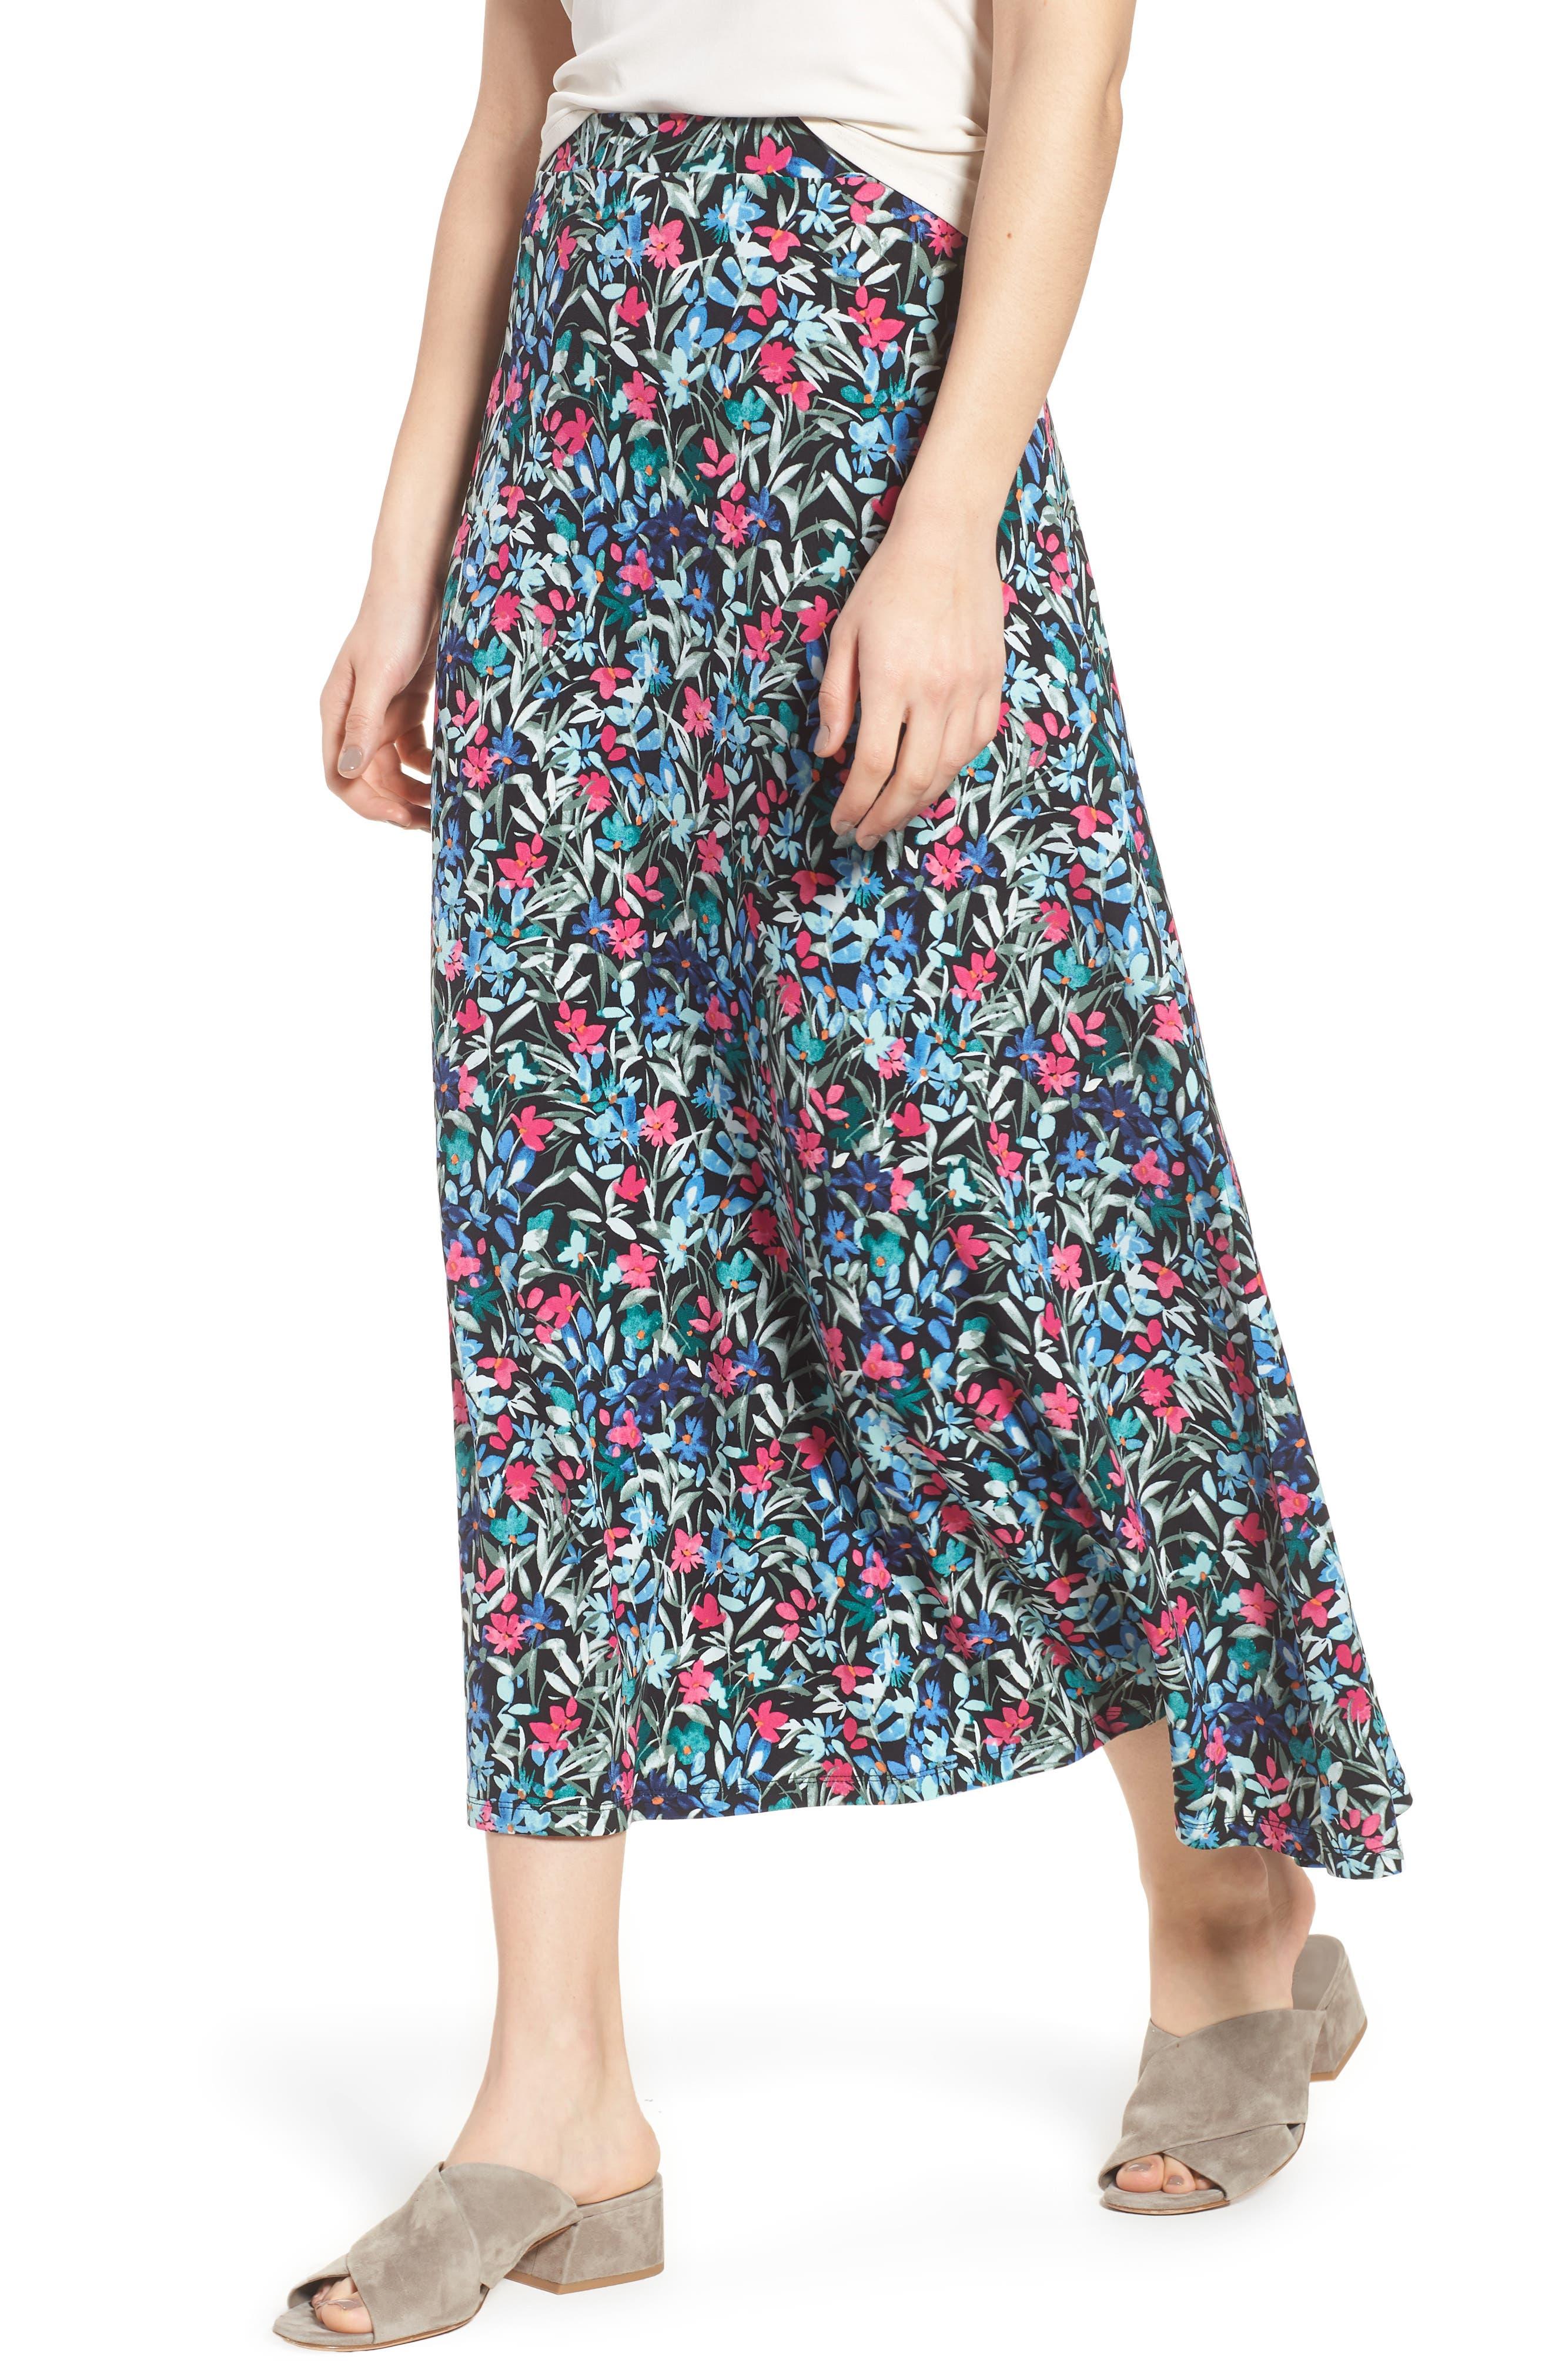 Radiant Flowers Maxi Skirt,                             Main thumbnail 1, color,                             060-Rich Black